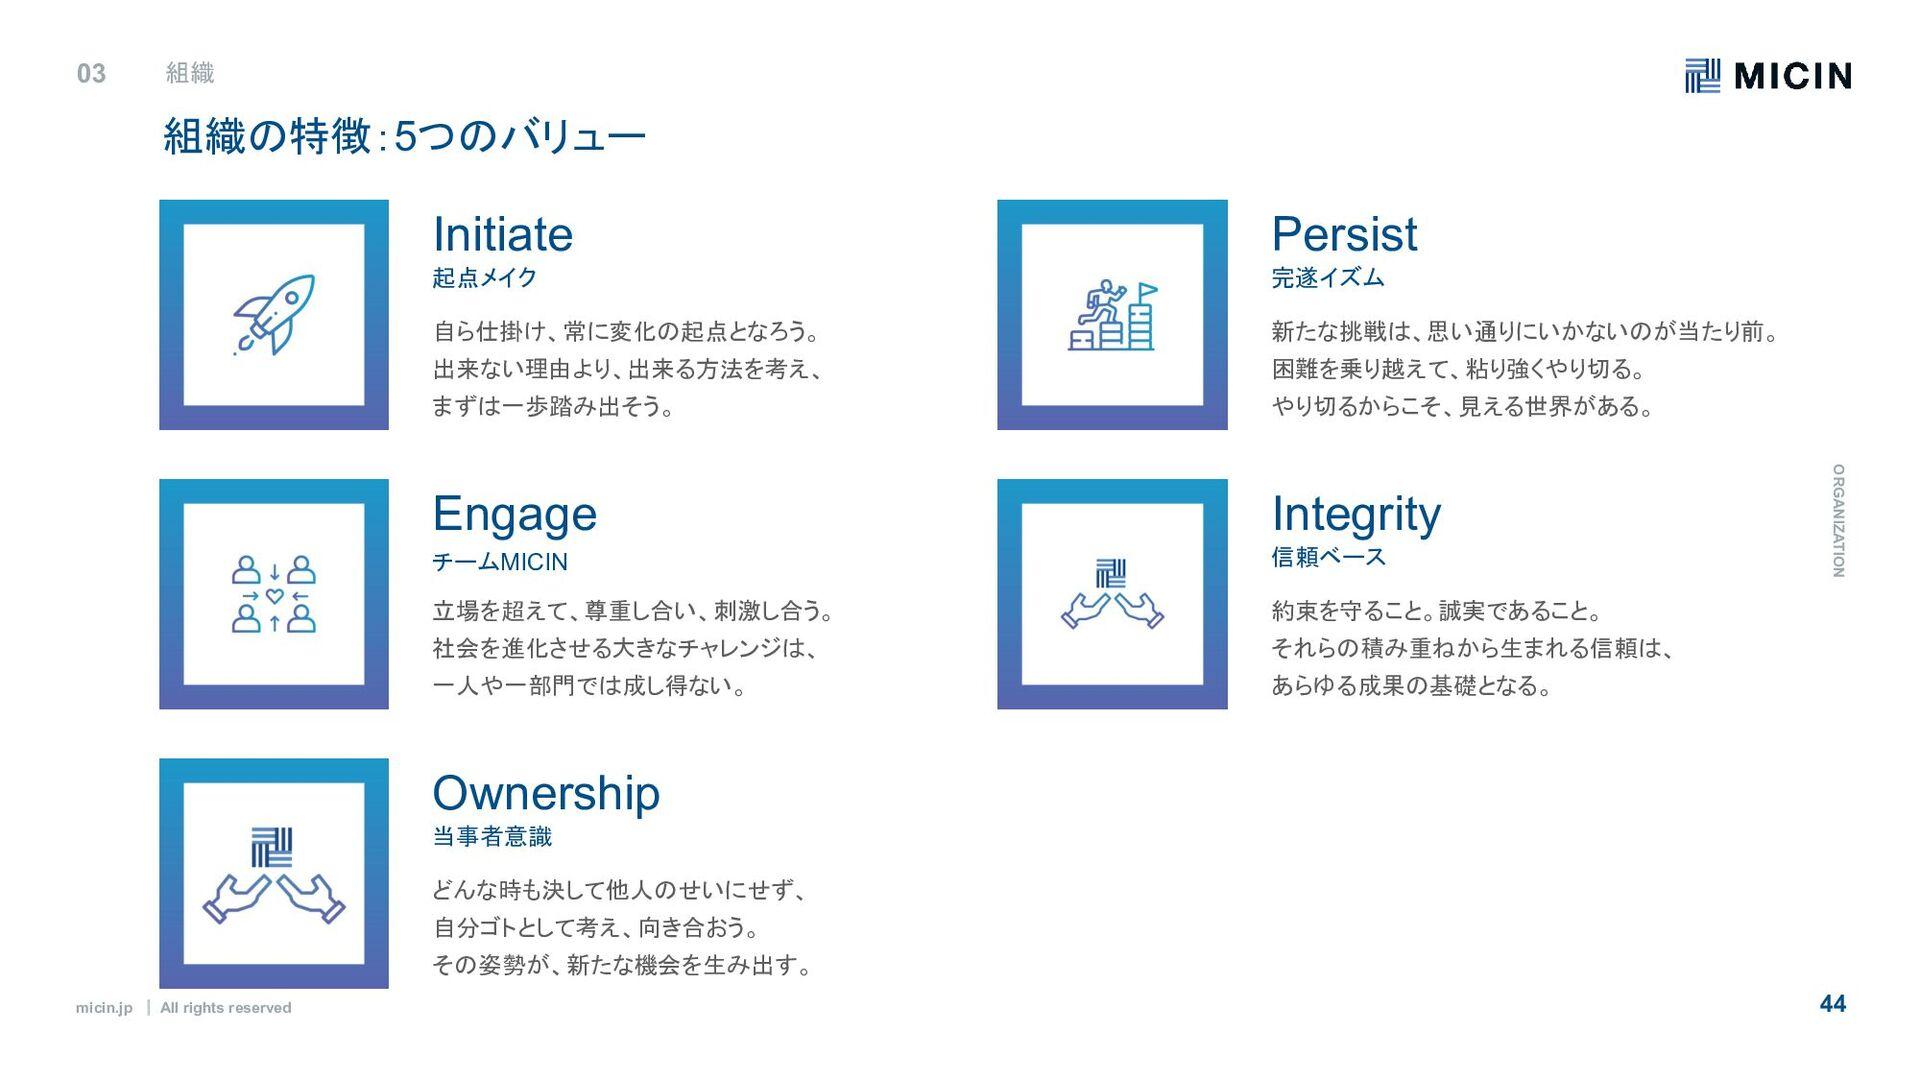 micin.jp ʛ All rights reserved 44 メンバー紹介 03 Y.K...